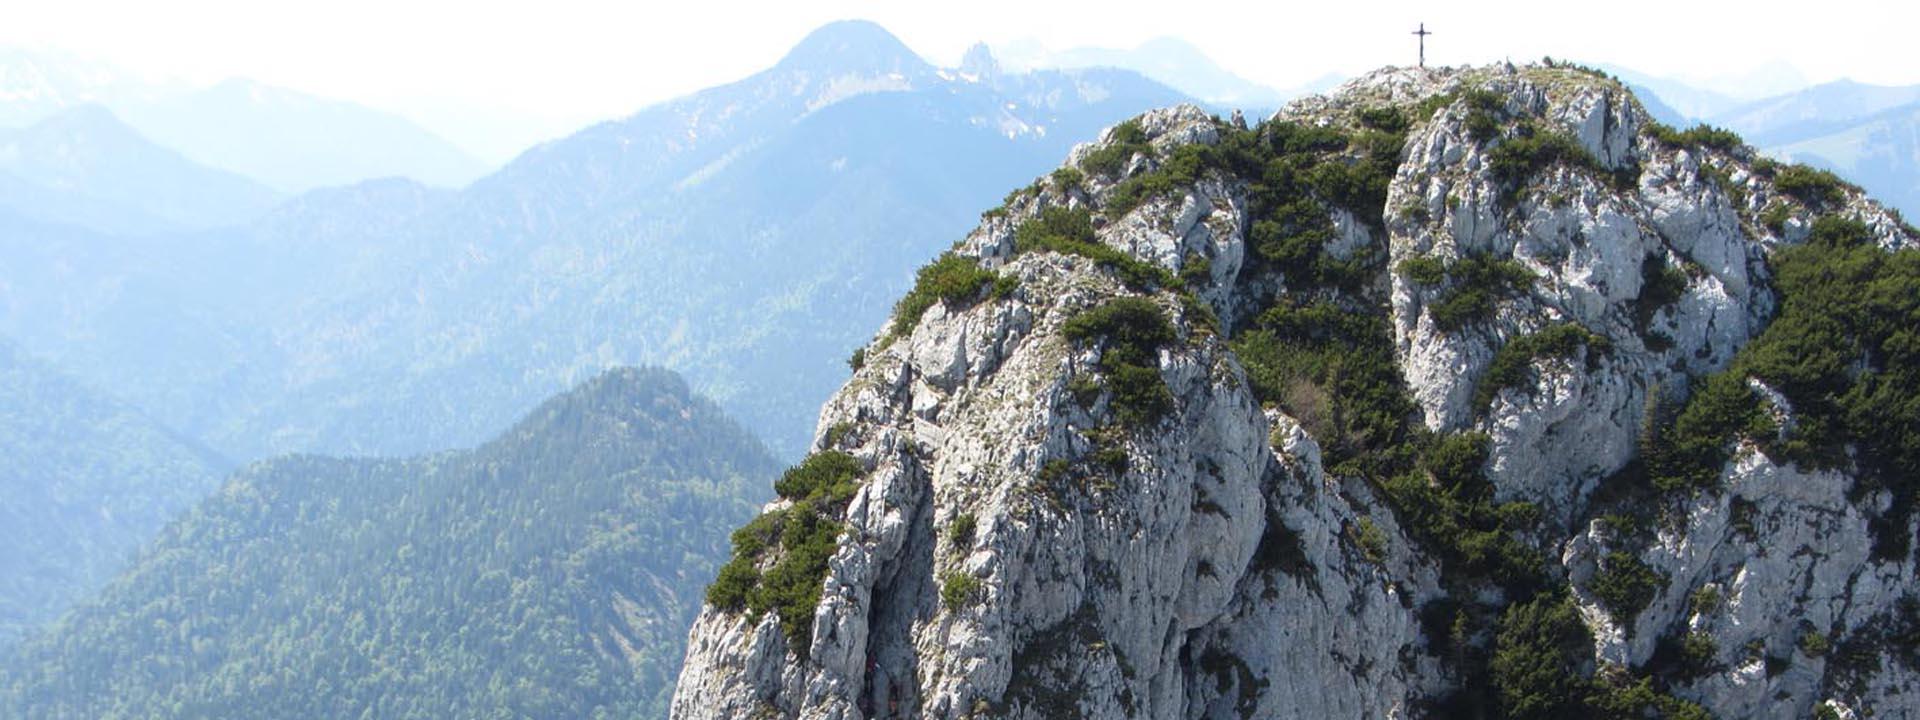 Hütte Berge Wanderung